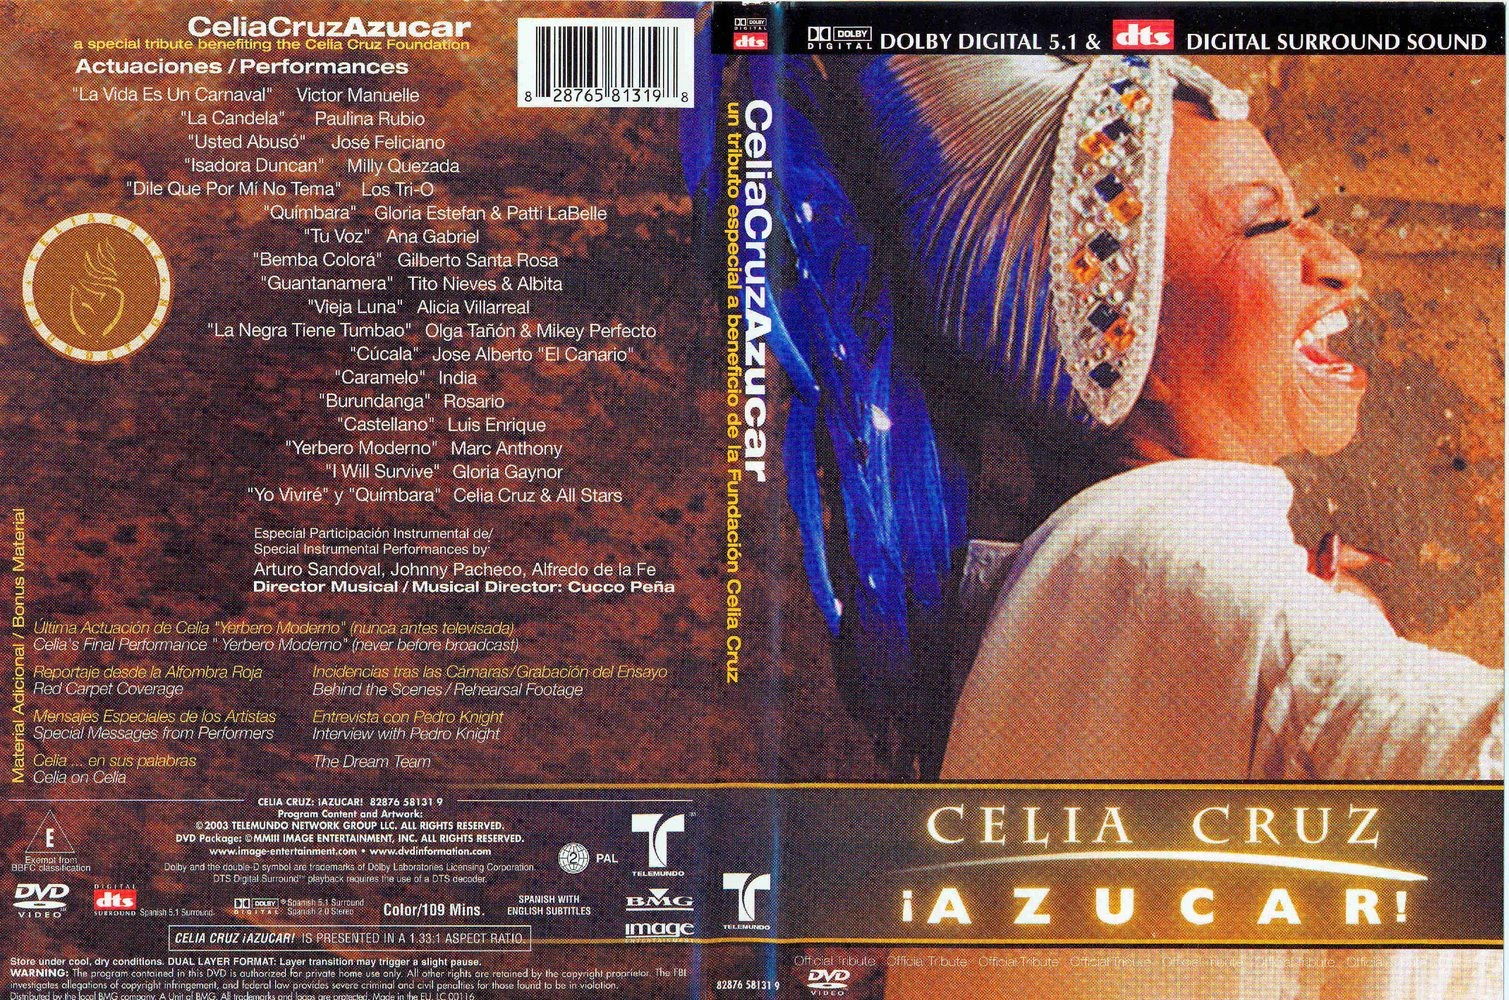 http://4.bp.blogspot.com/_PiUVny6RPwY/S8XaaUCvWCI/AAAAAAAAAjo/hQ_eGa5_7vs/s1600/Celia+Cruz+Azucar.jpg